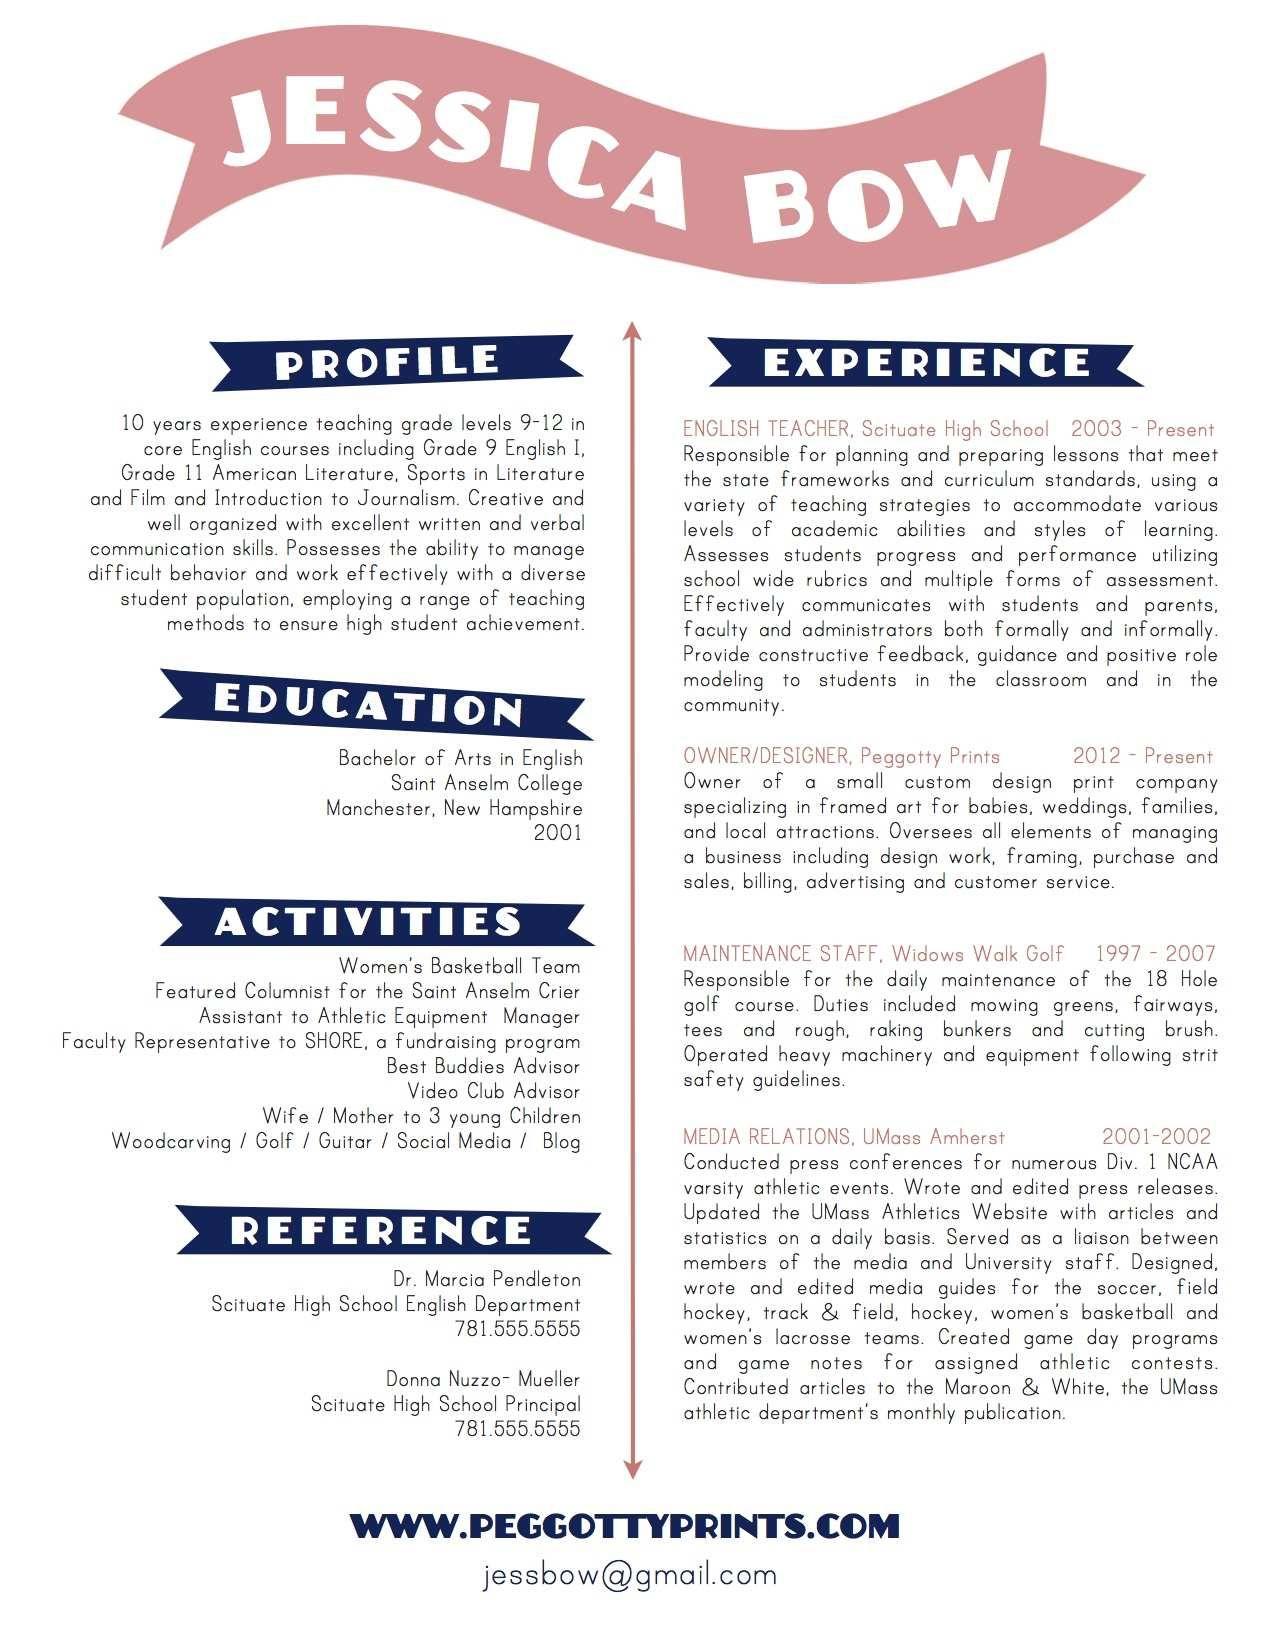 Prints Resume Nail Technician in 2020 Teaching grade